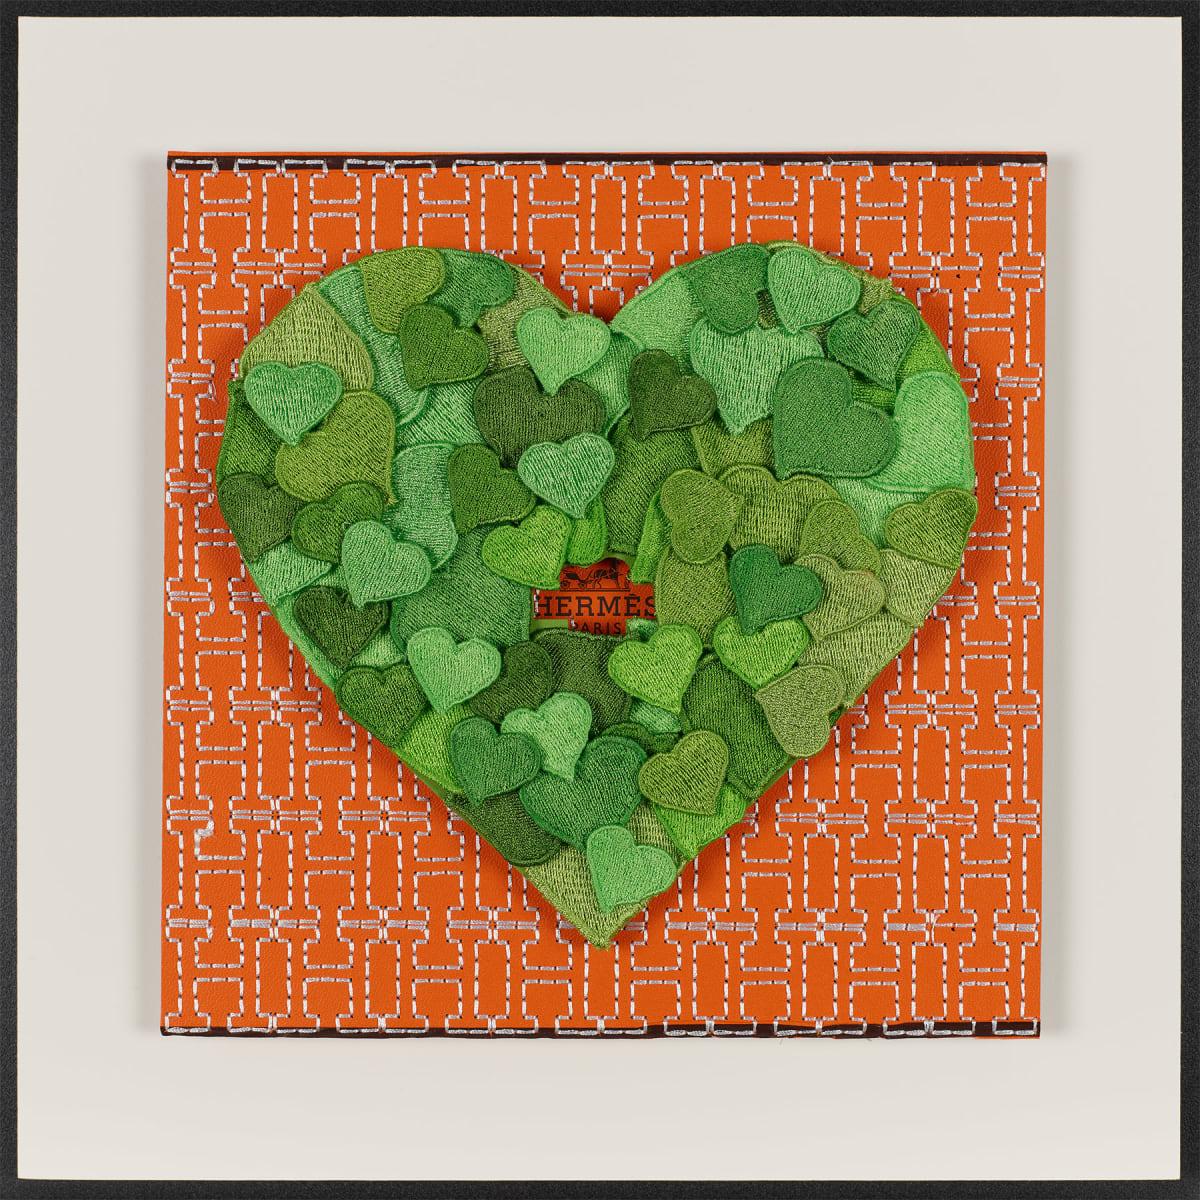 Stephen Wilson, Hermes Hearts, Green, 2019